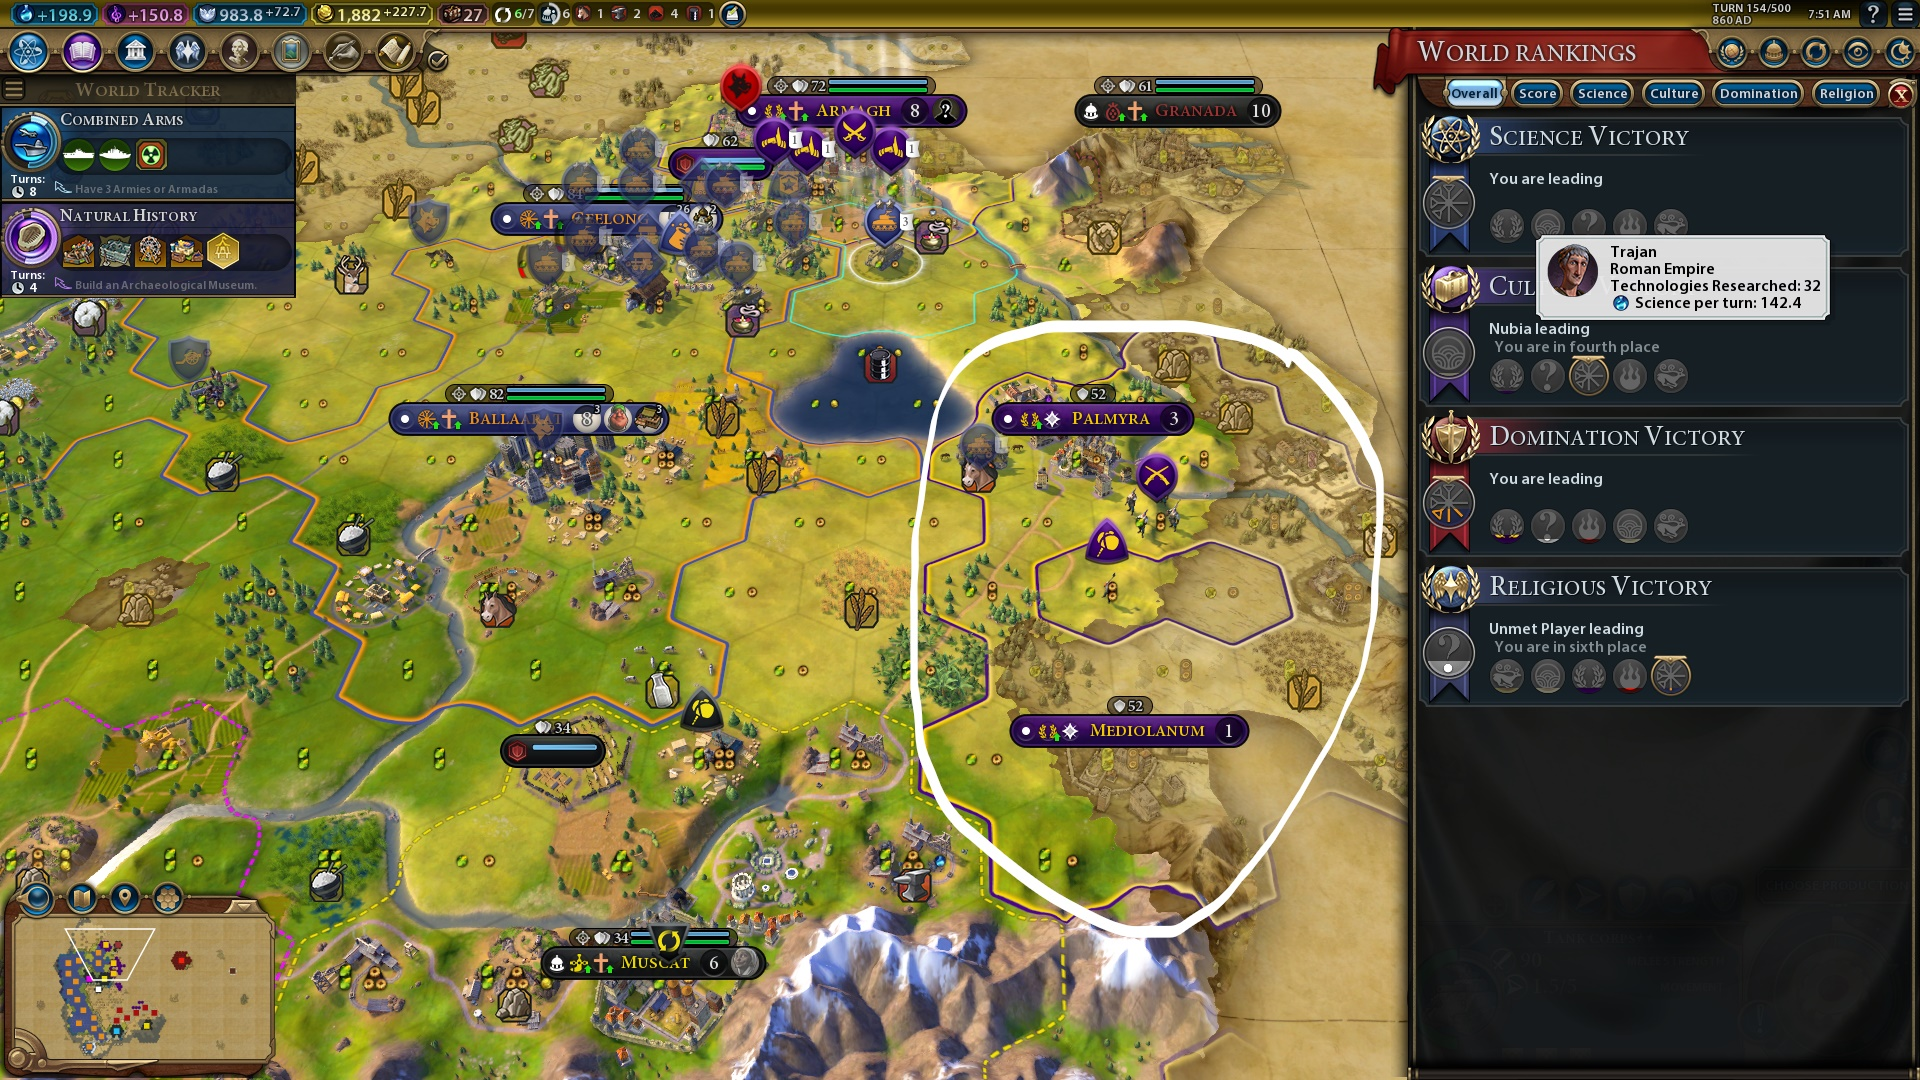 Sid Meier's Civilization VI (DX11) 6_20_2018 7_51_17 AM_LI.jpg